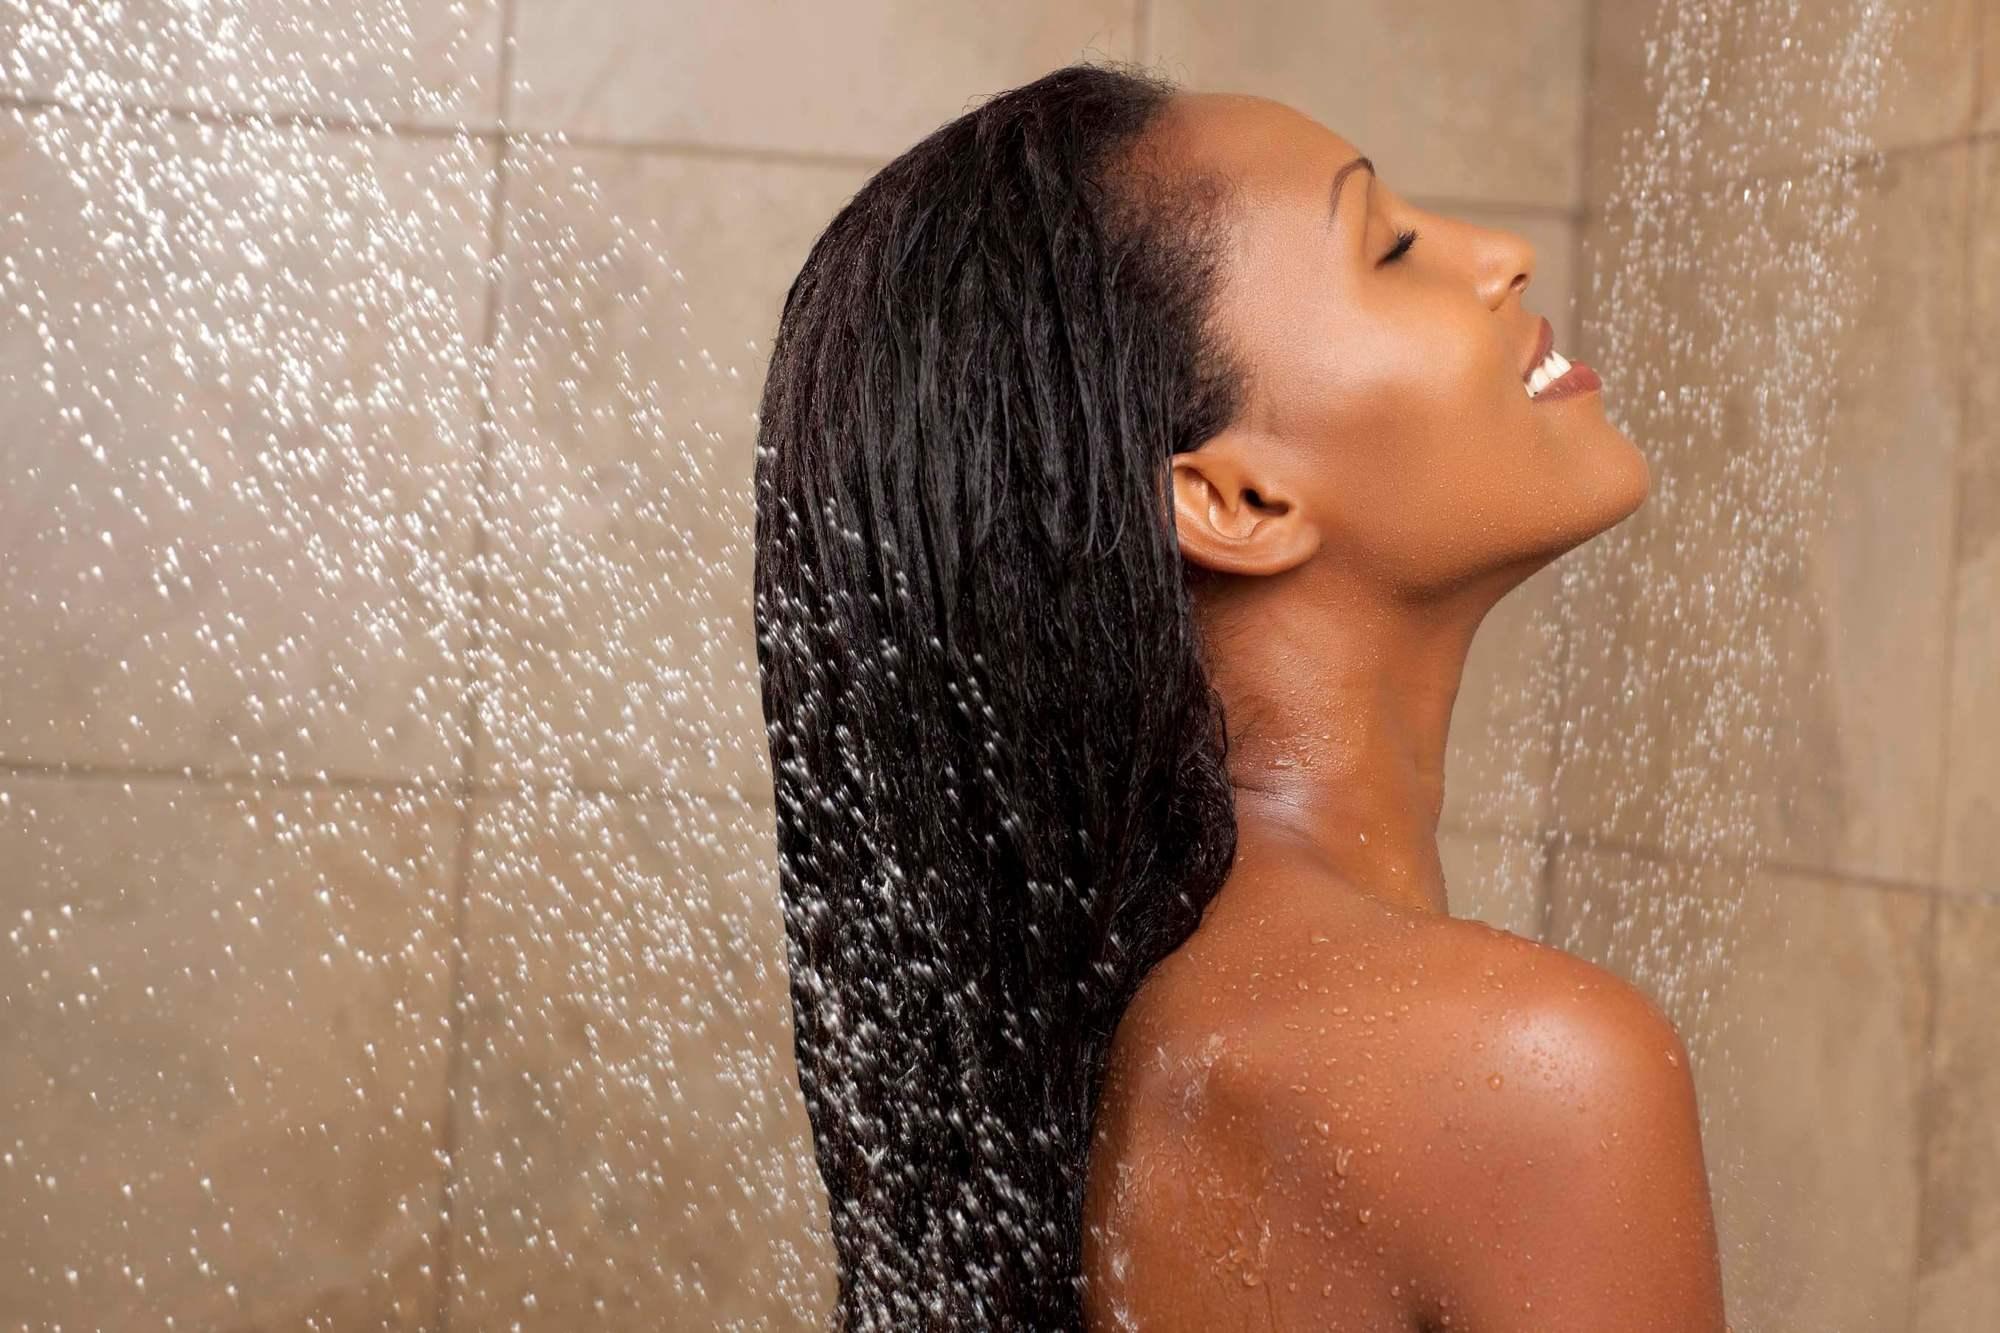 Black woman enjoying a shower